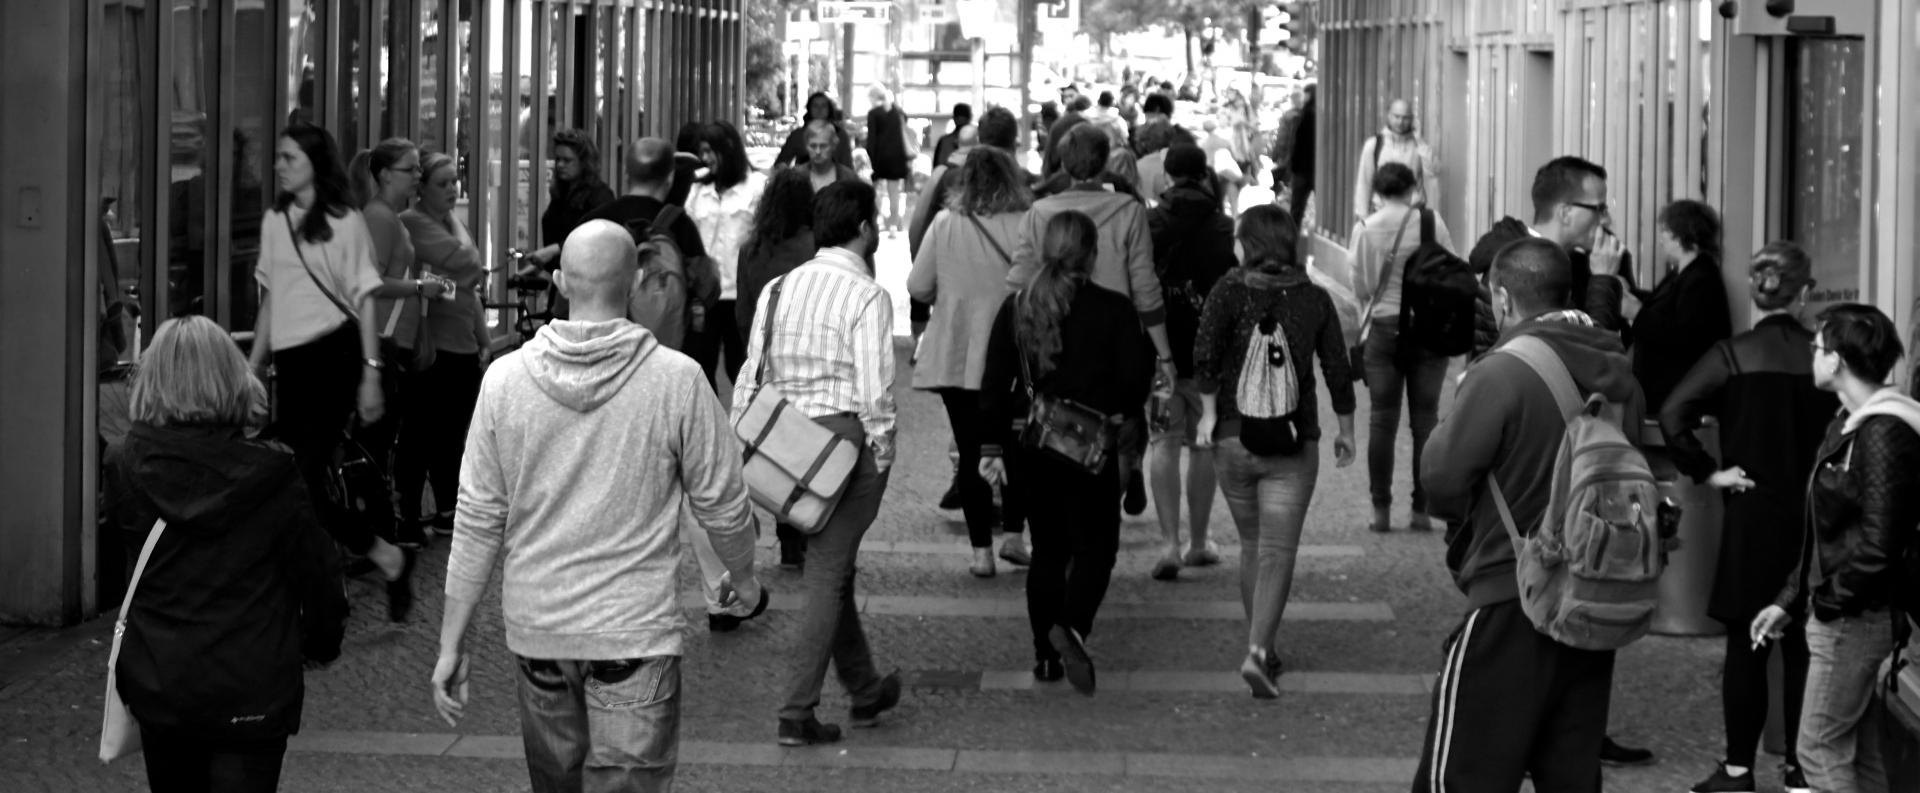 black and white black and white community 9816 e1553436392785